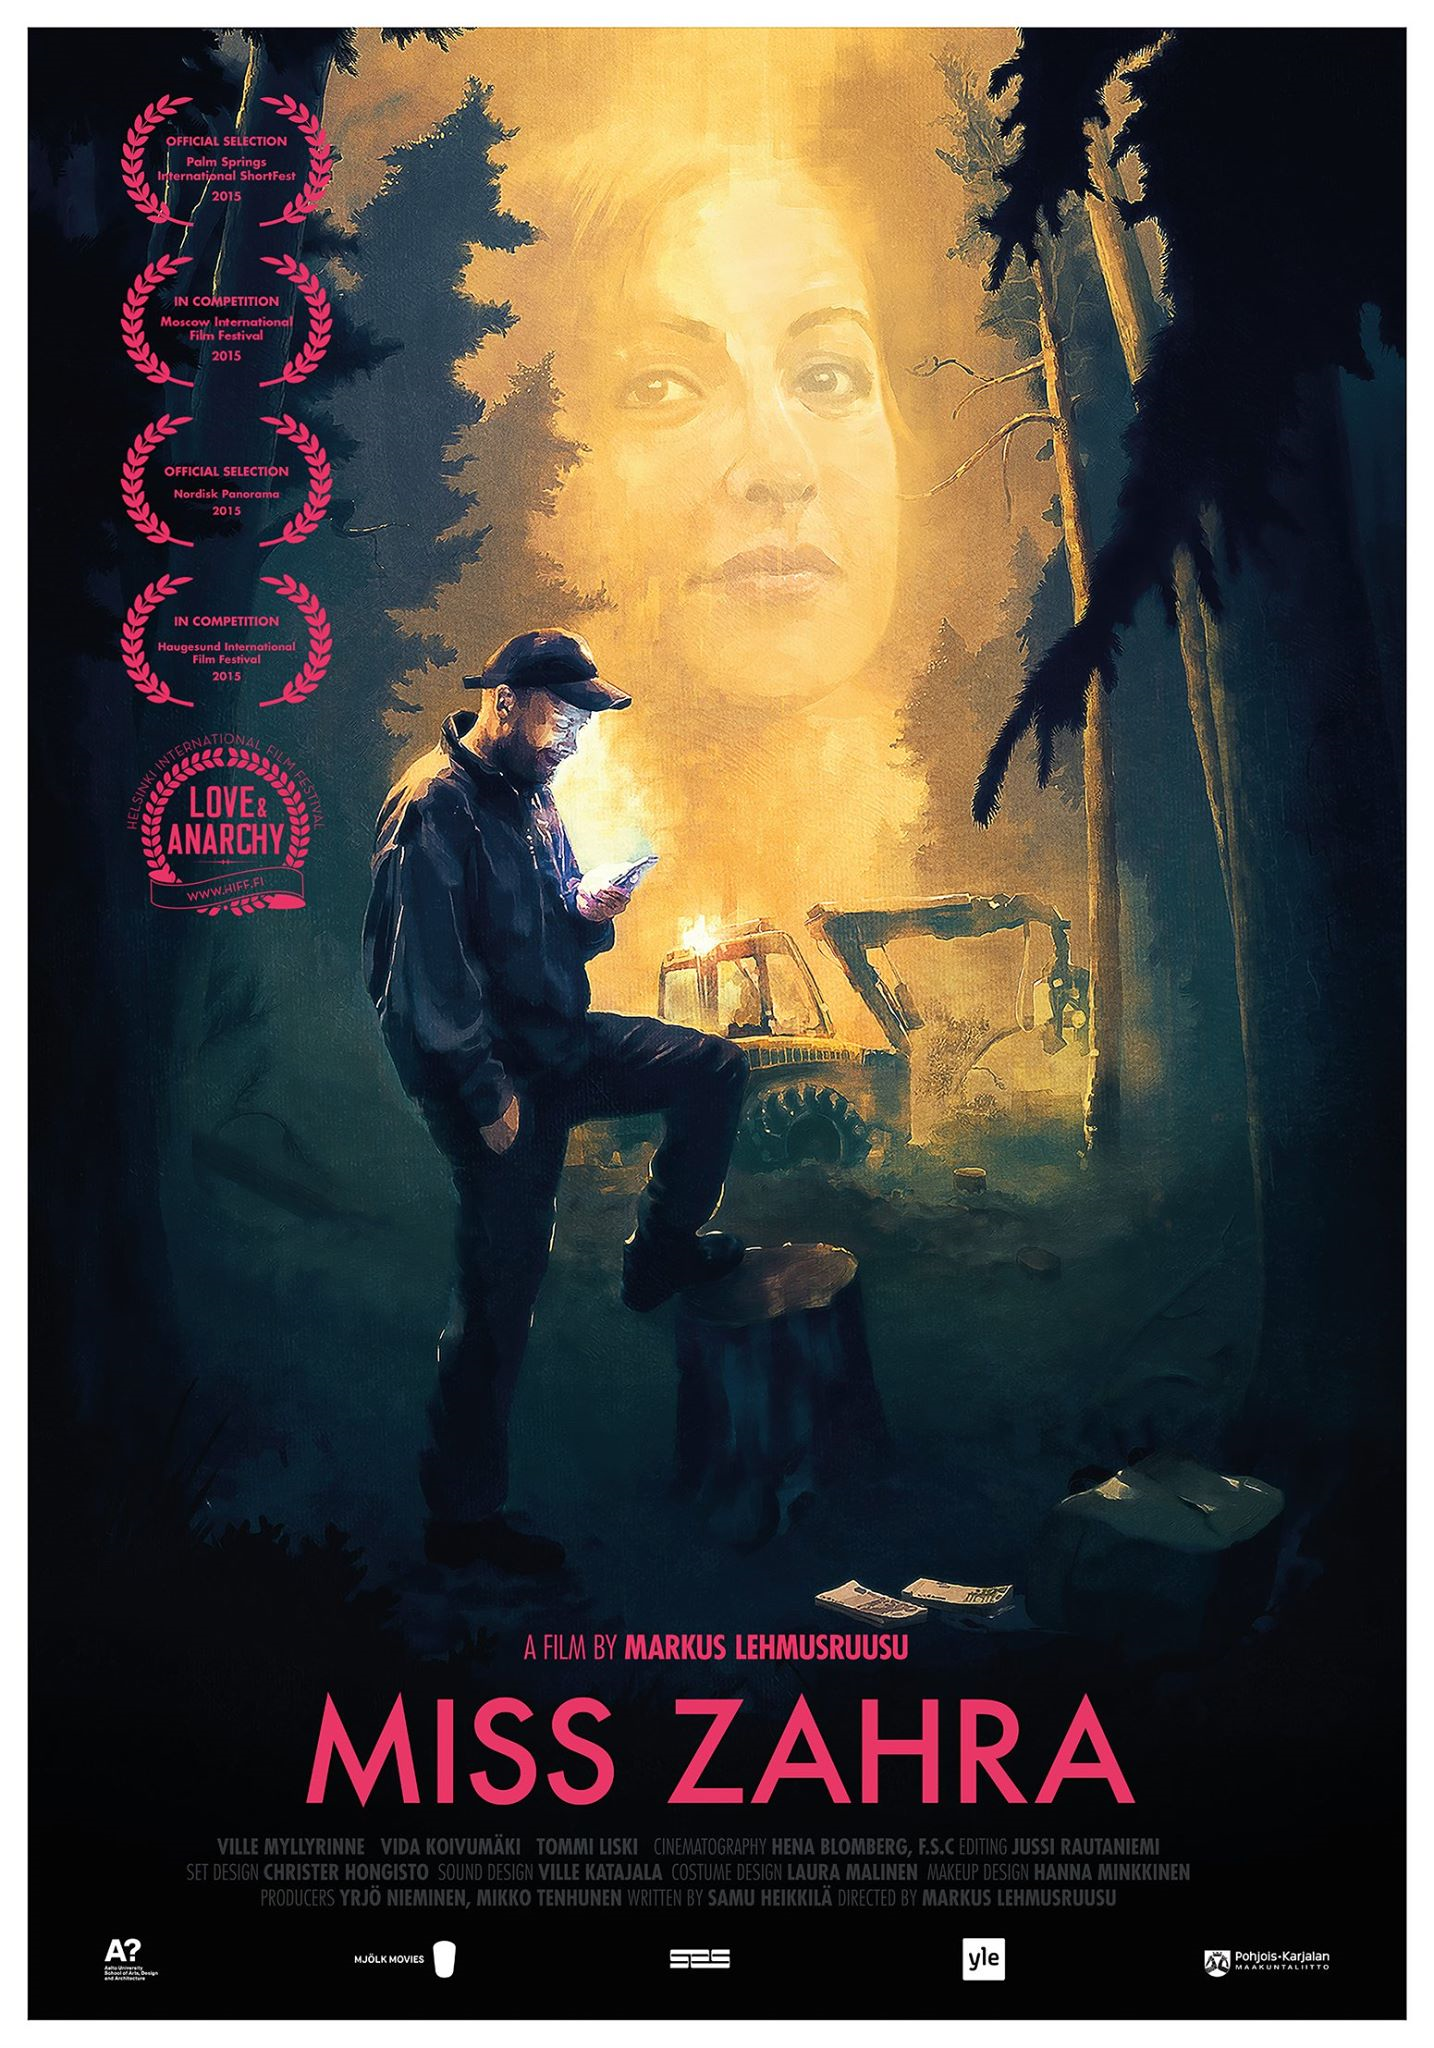 MISS ZAHRA    dir. Markus Lehmusruusu   Mjölk Movies, 29 min   2015